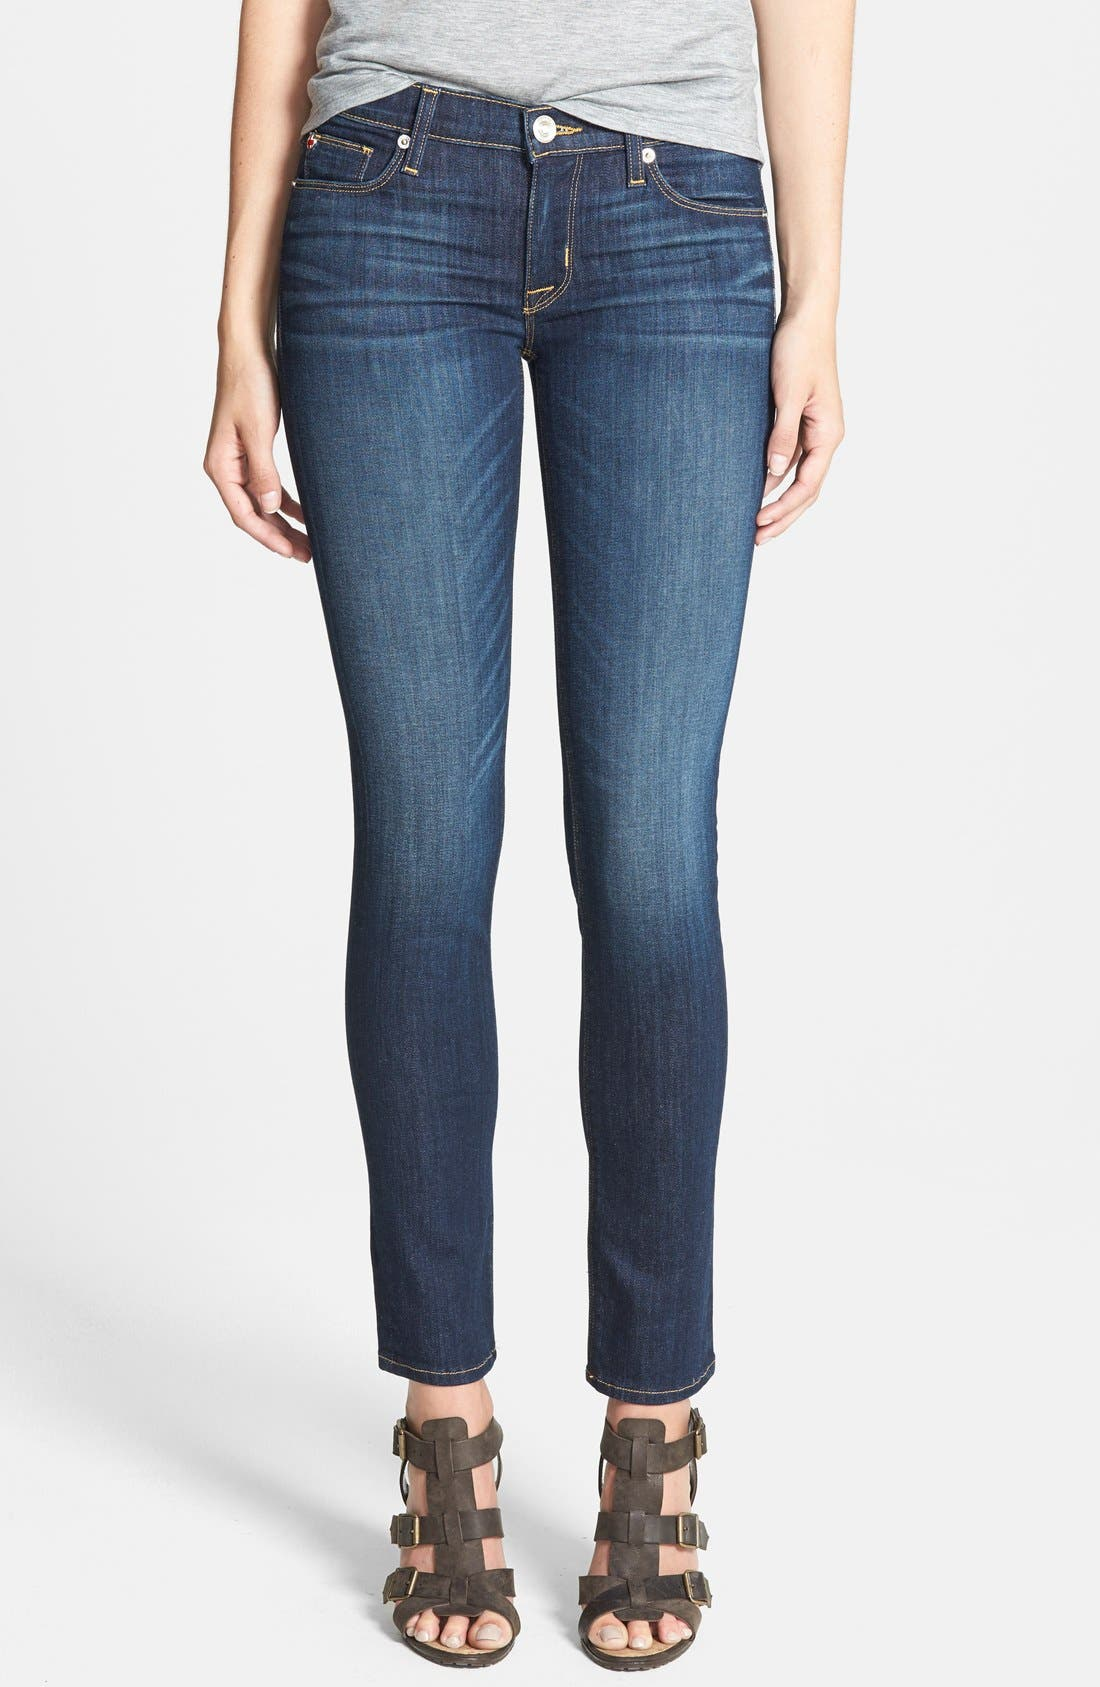 Alternate Image 1 Selected - Hudson Jeans 'Collette' Skinny Jeans (Stella)